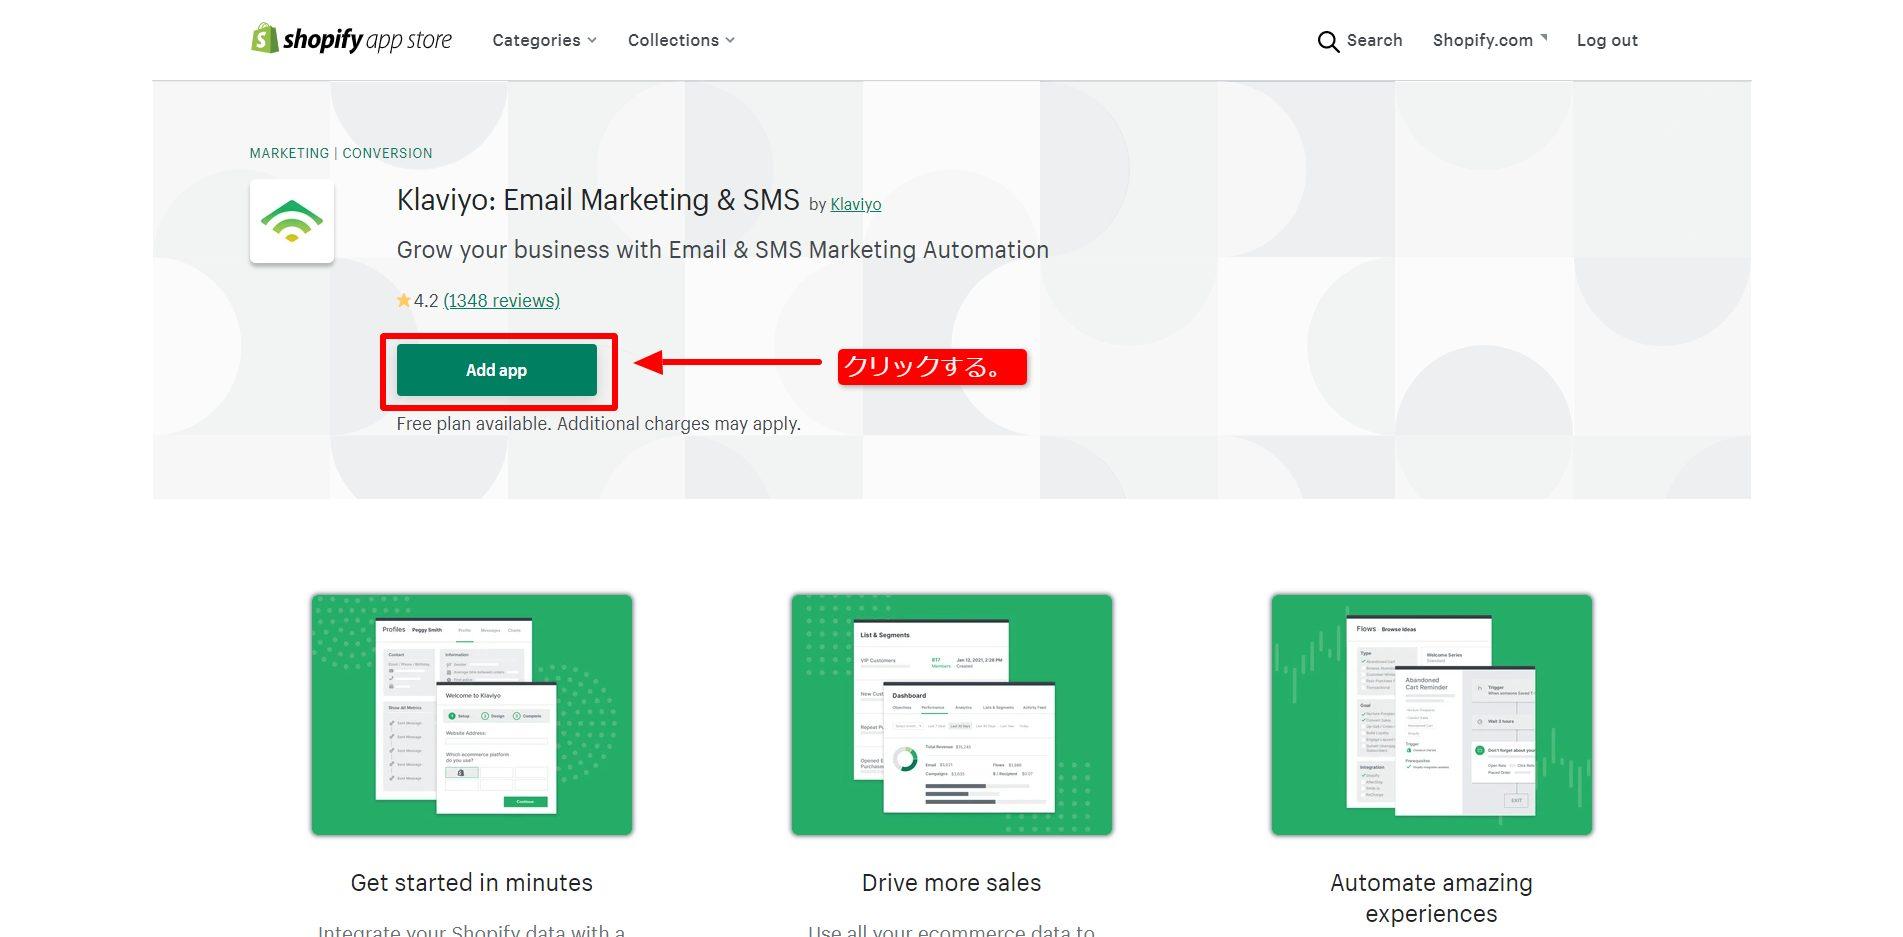 Klaviyo: Email Marketing & SMSのShopifyアプリストアからインストールする。